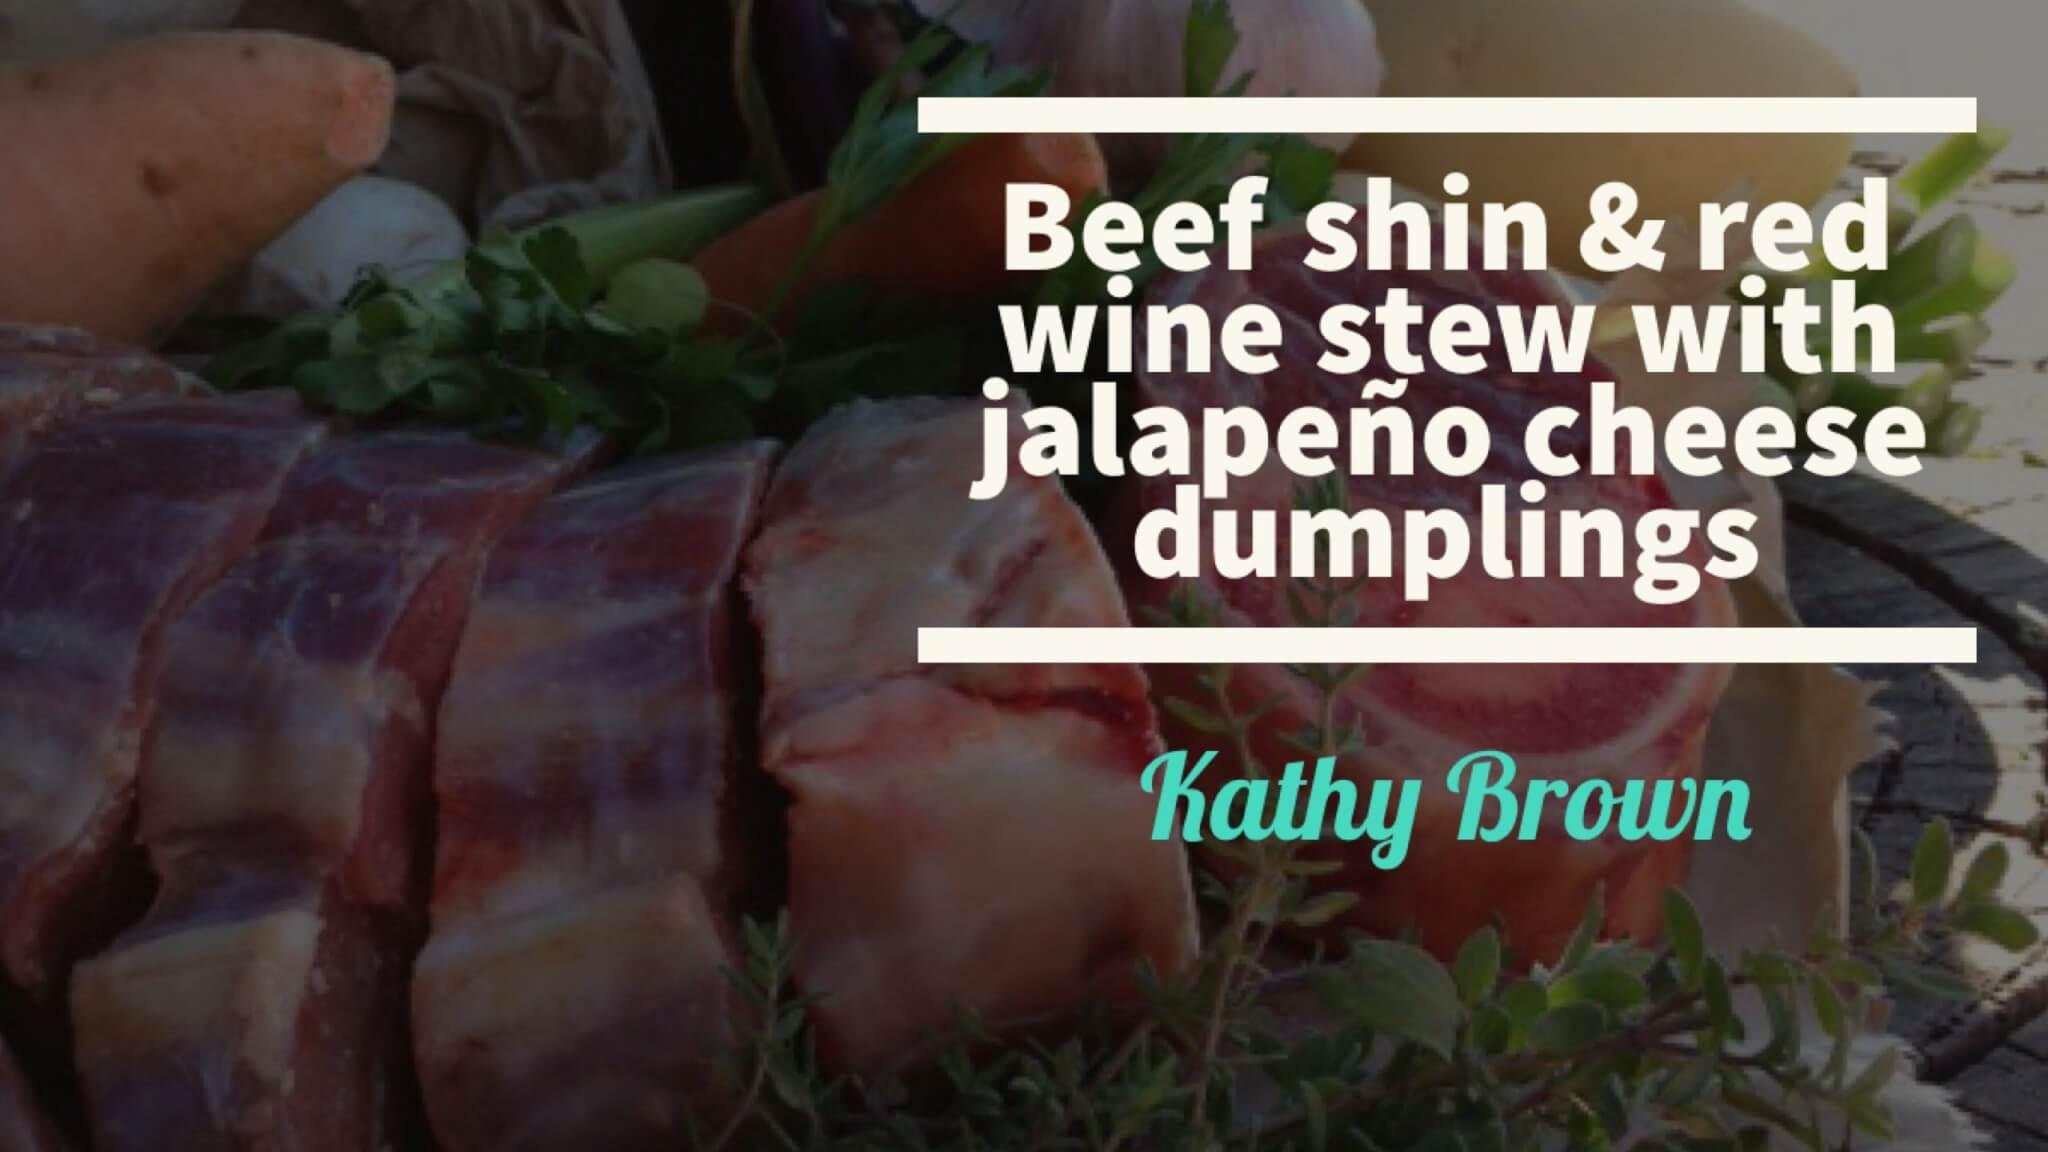 Beef Shin & Red Wine Stewwith Jalapeño Cheese Dumplings | Kathy Brown